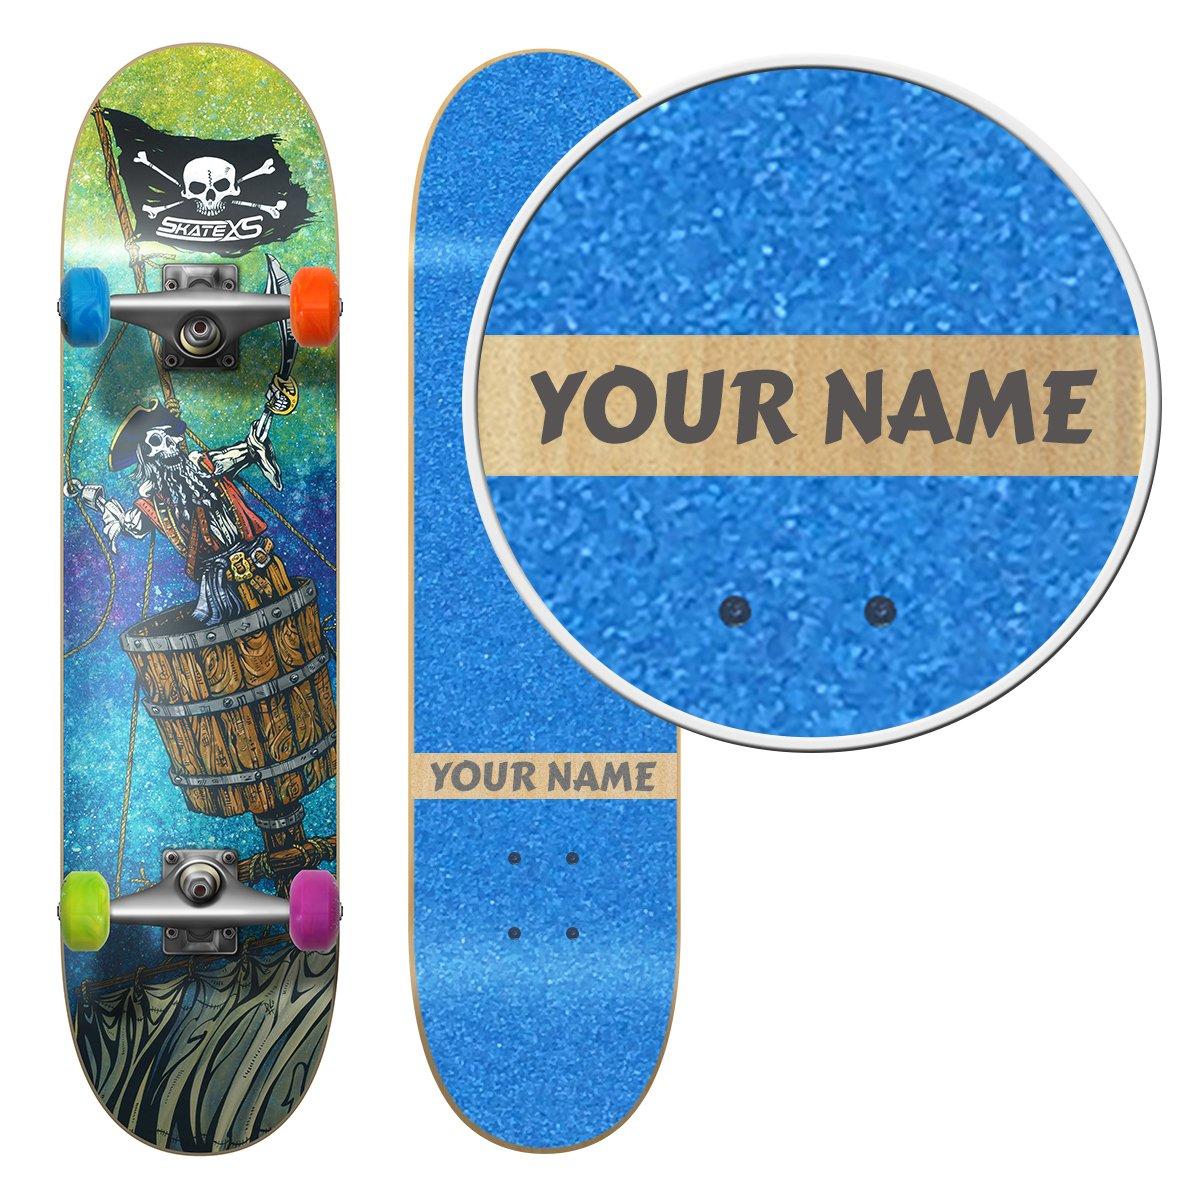 SkateXS Personalized Beginner Pirate Street Skateboard